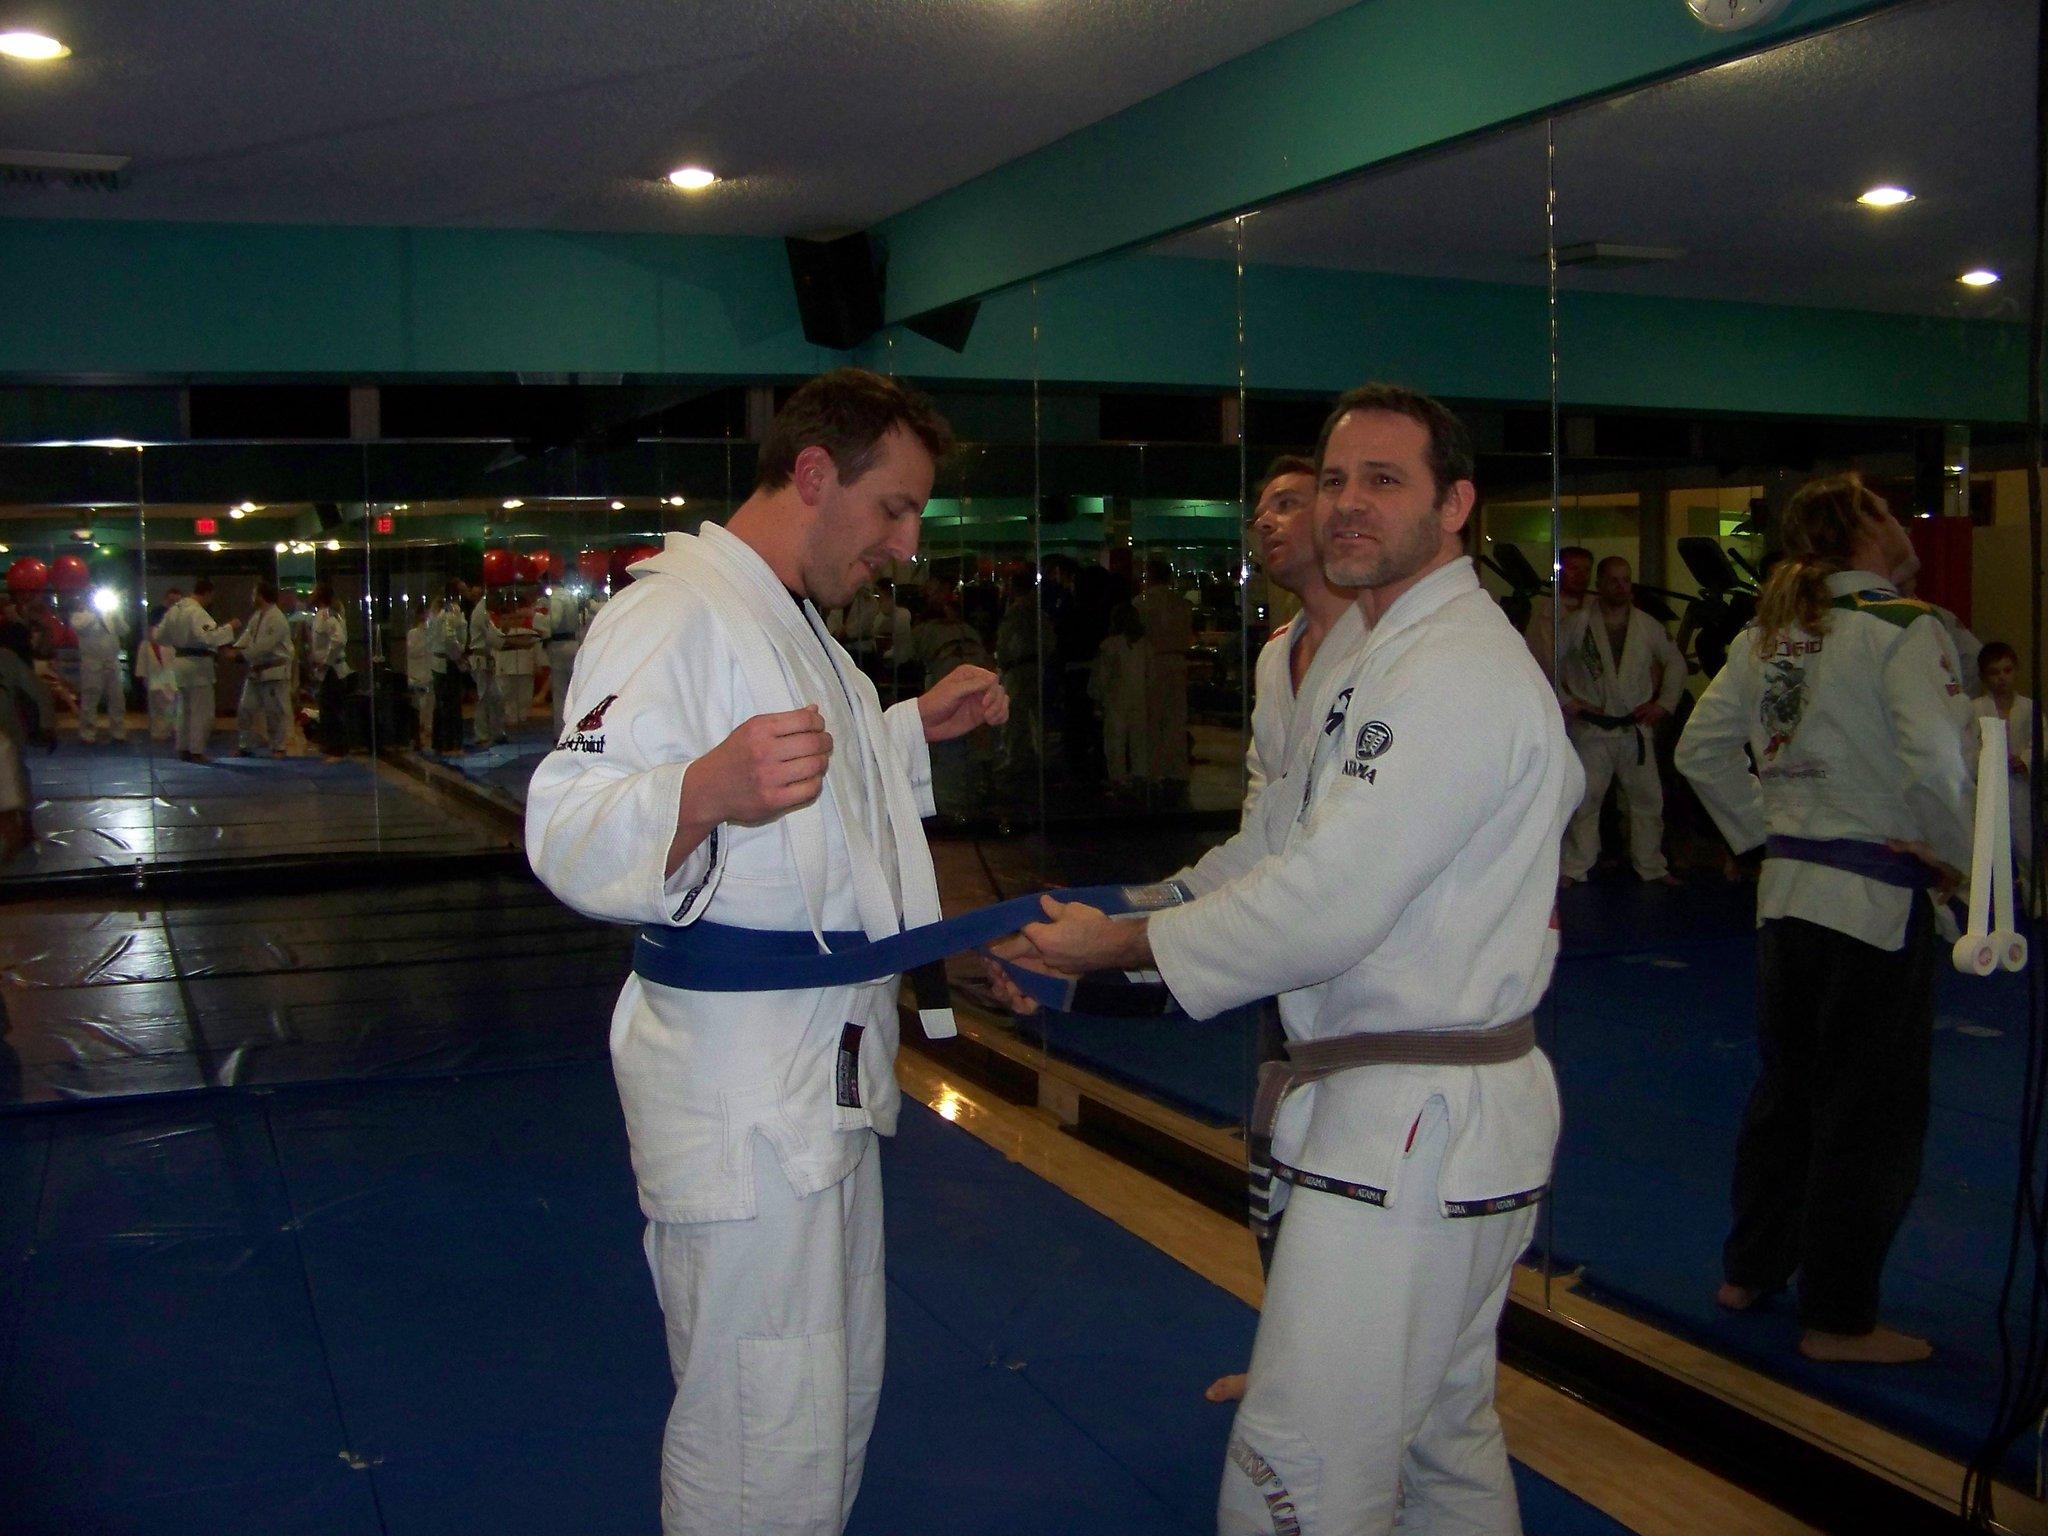 Relson Gracie Black Belt (at the time a brown belt) Shane Briggs, awarding me my blue belt at Jiu Jitsu Nation in Myrtle Beach, SC.